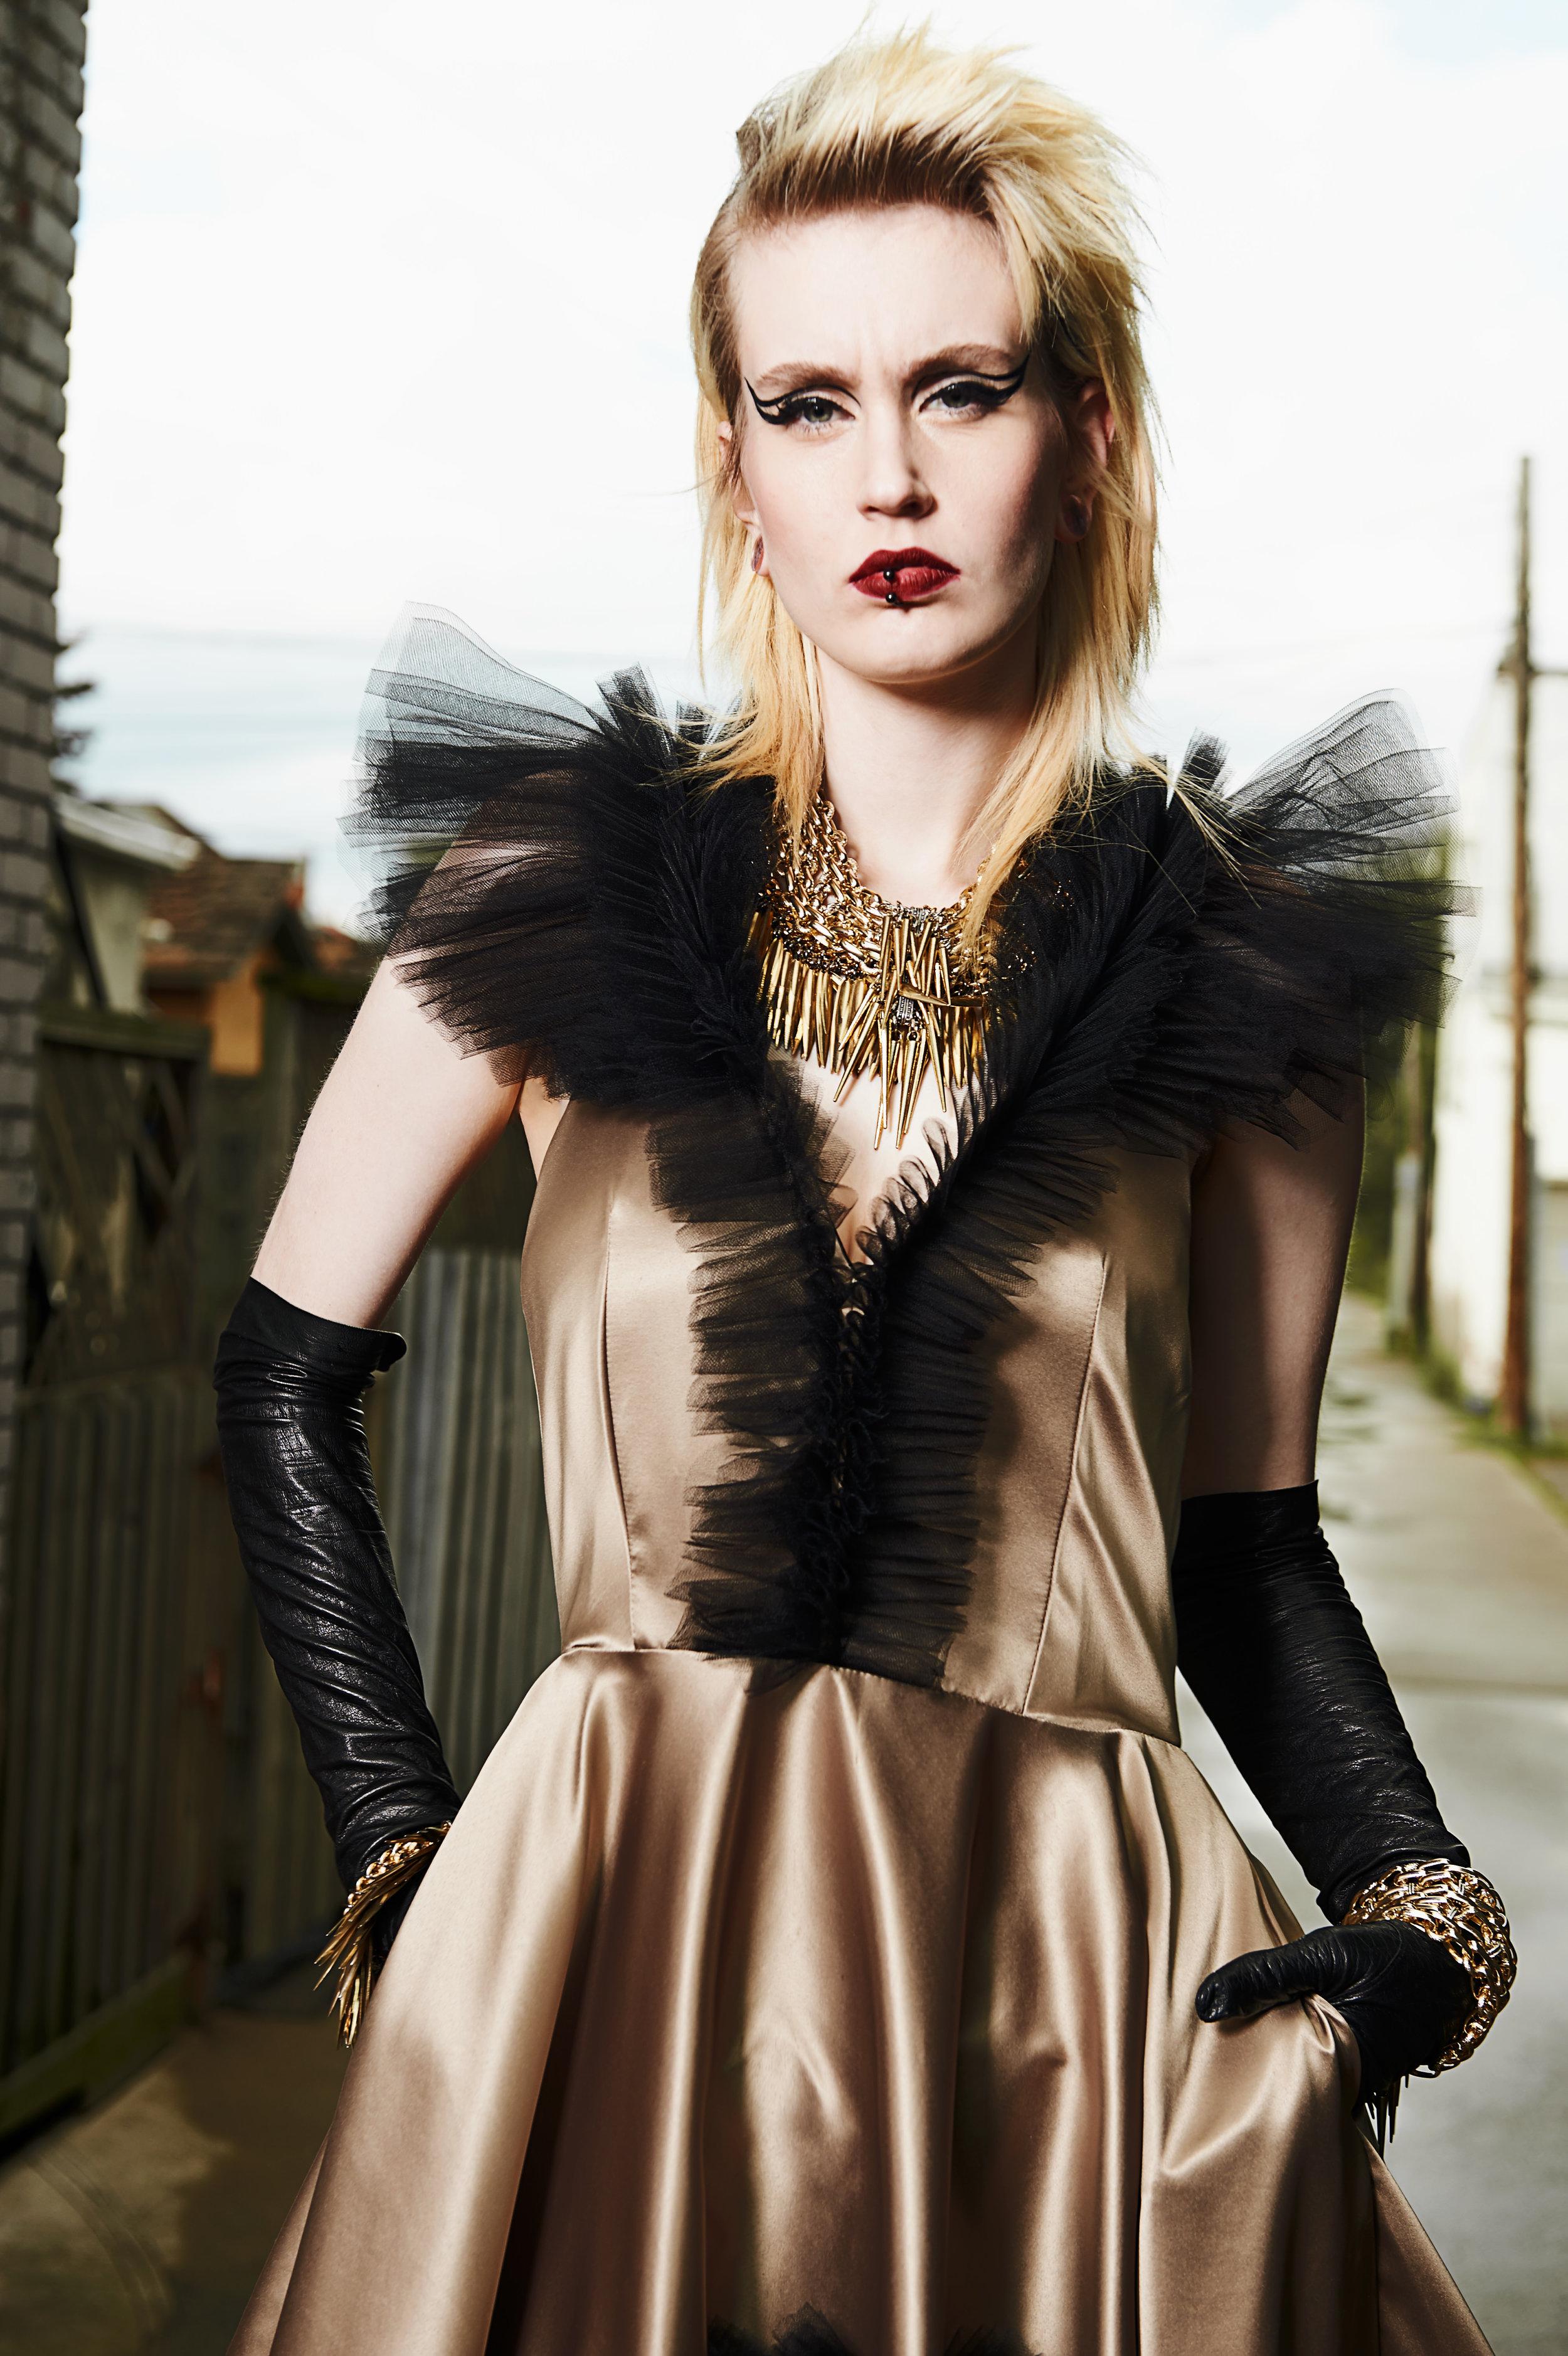 Marta-Hewson-Hamilton-Magazine-Fall-Designers-35280.jpg